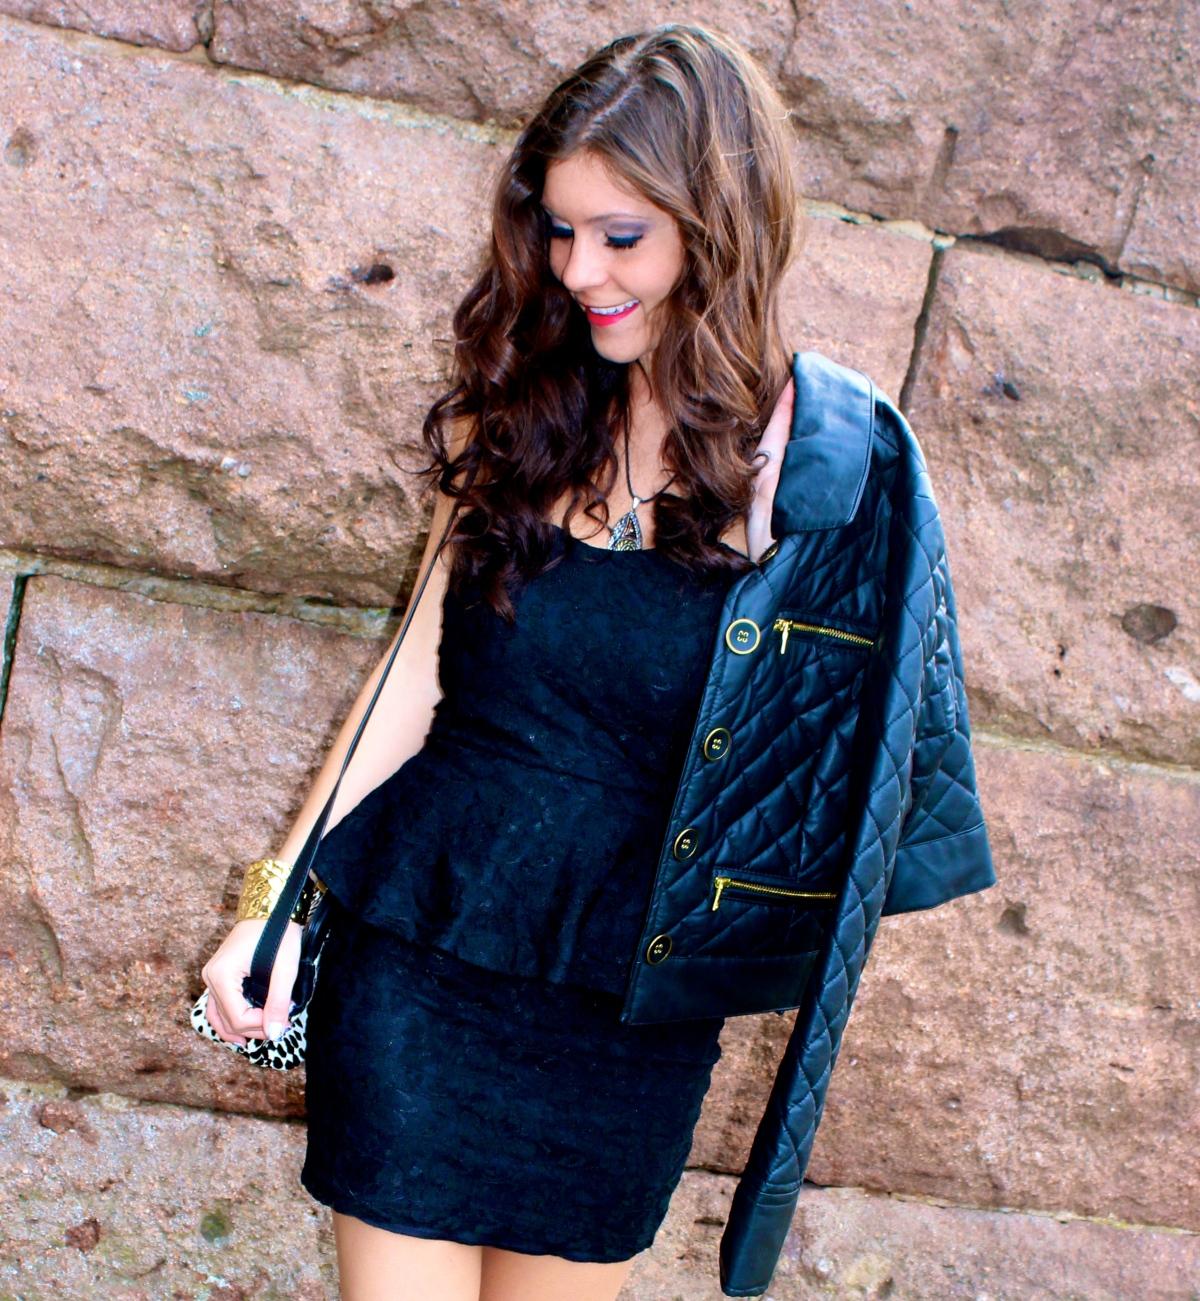 Lace Peplum Dress - Alexa Mellardo